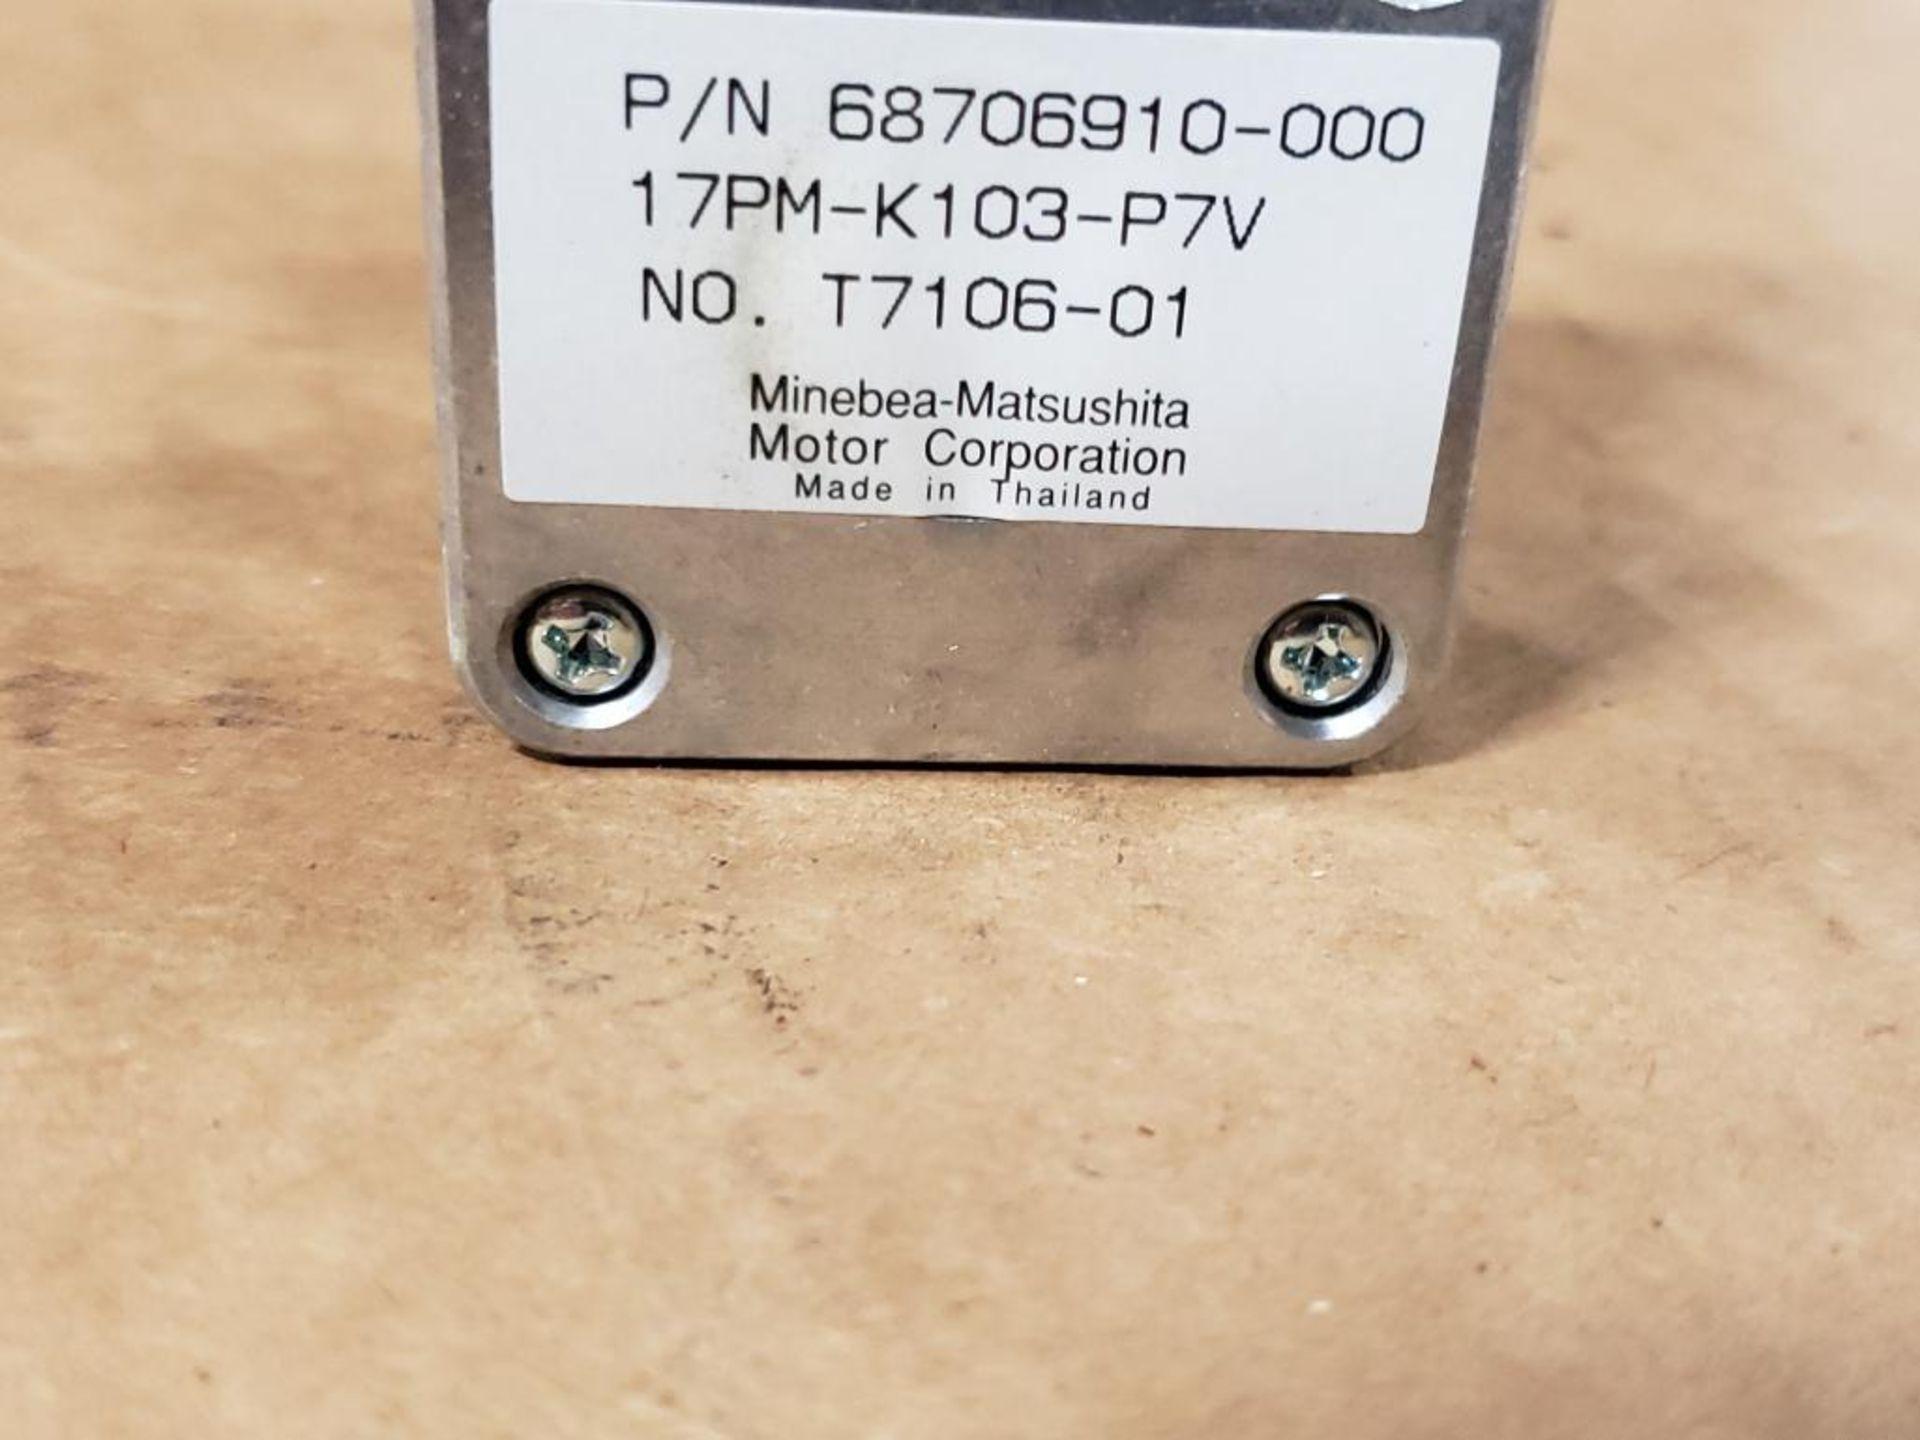 Qty 45 - Minebea-Matsushita Motor Corp 68706910-000 motor. 17PM-K103-P7V, No.-T7106-01. - Image 3 of 6